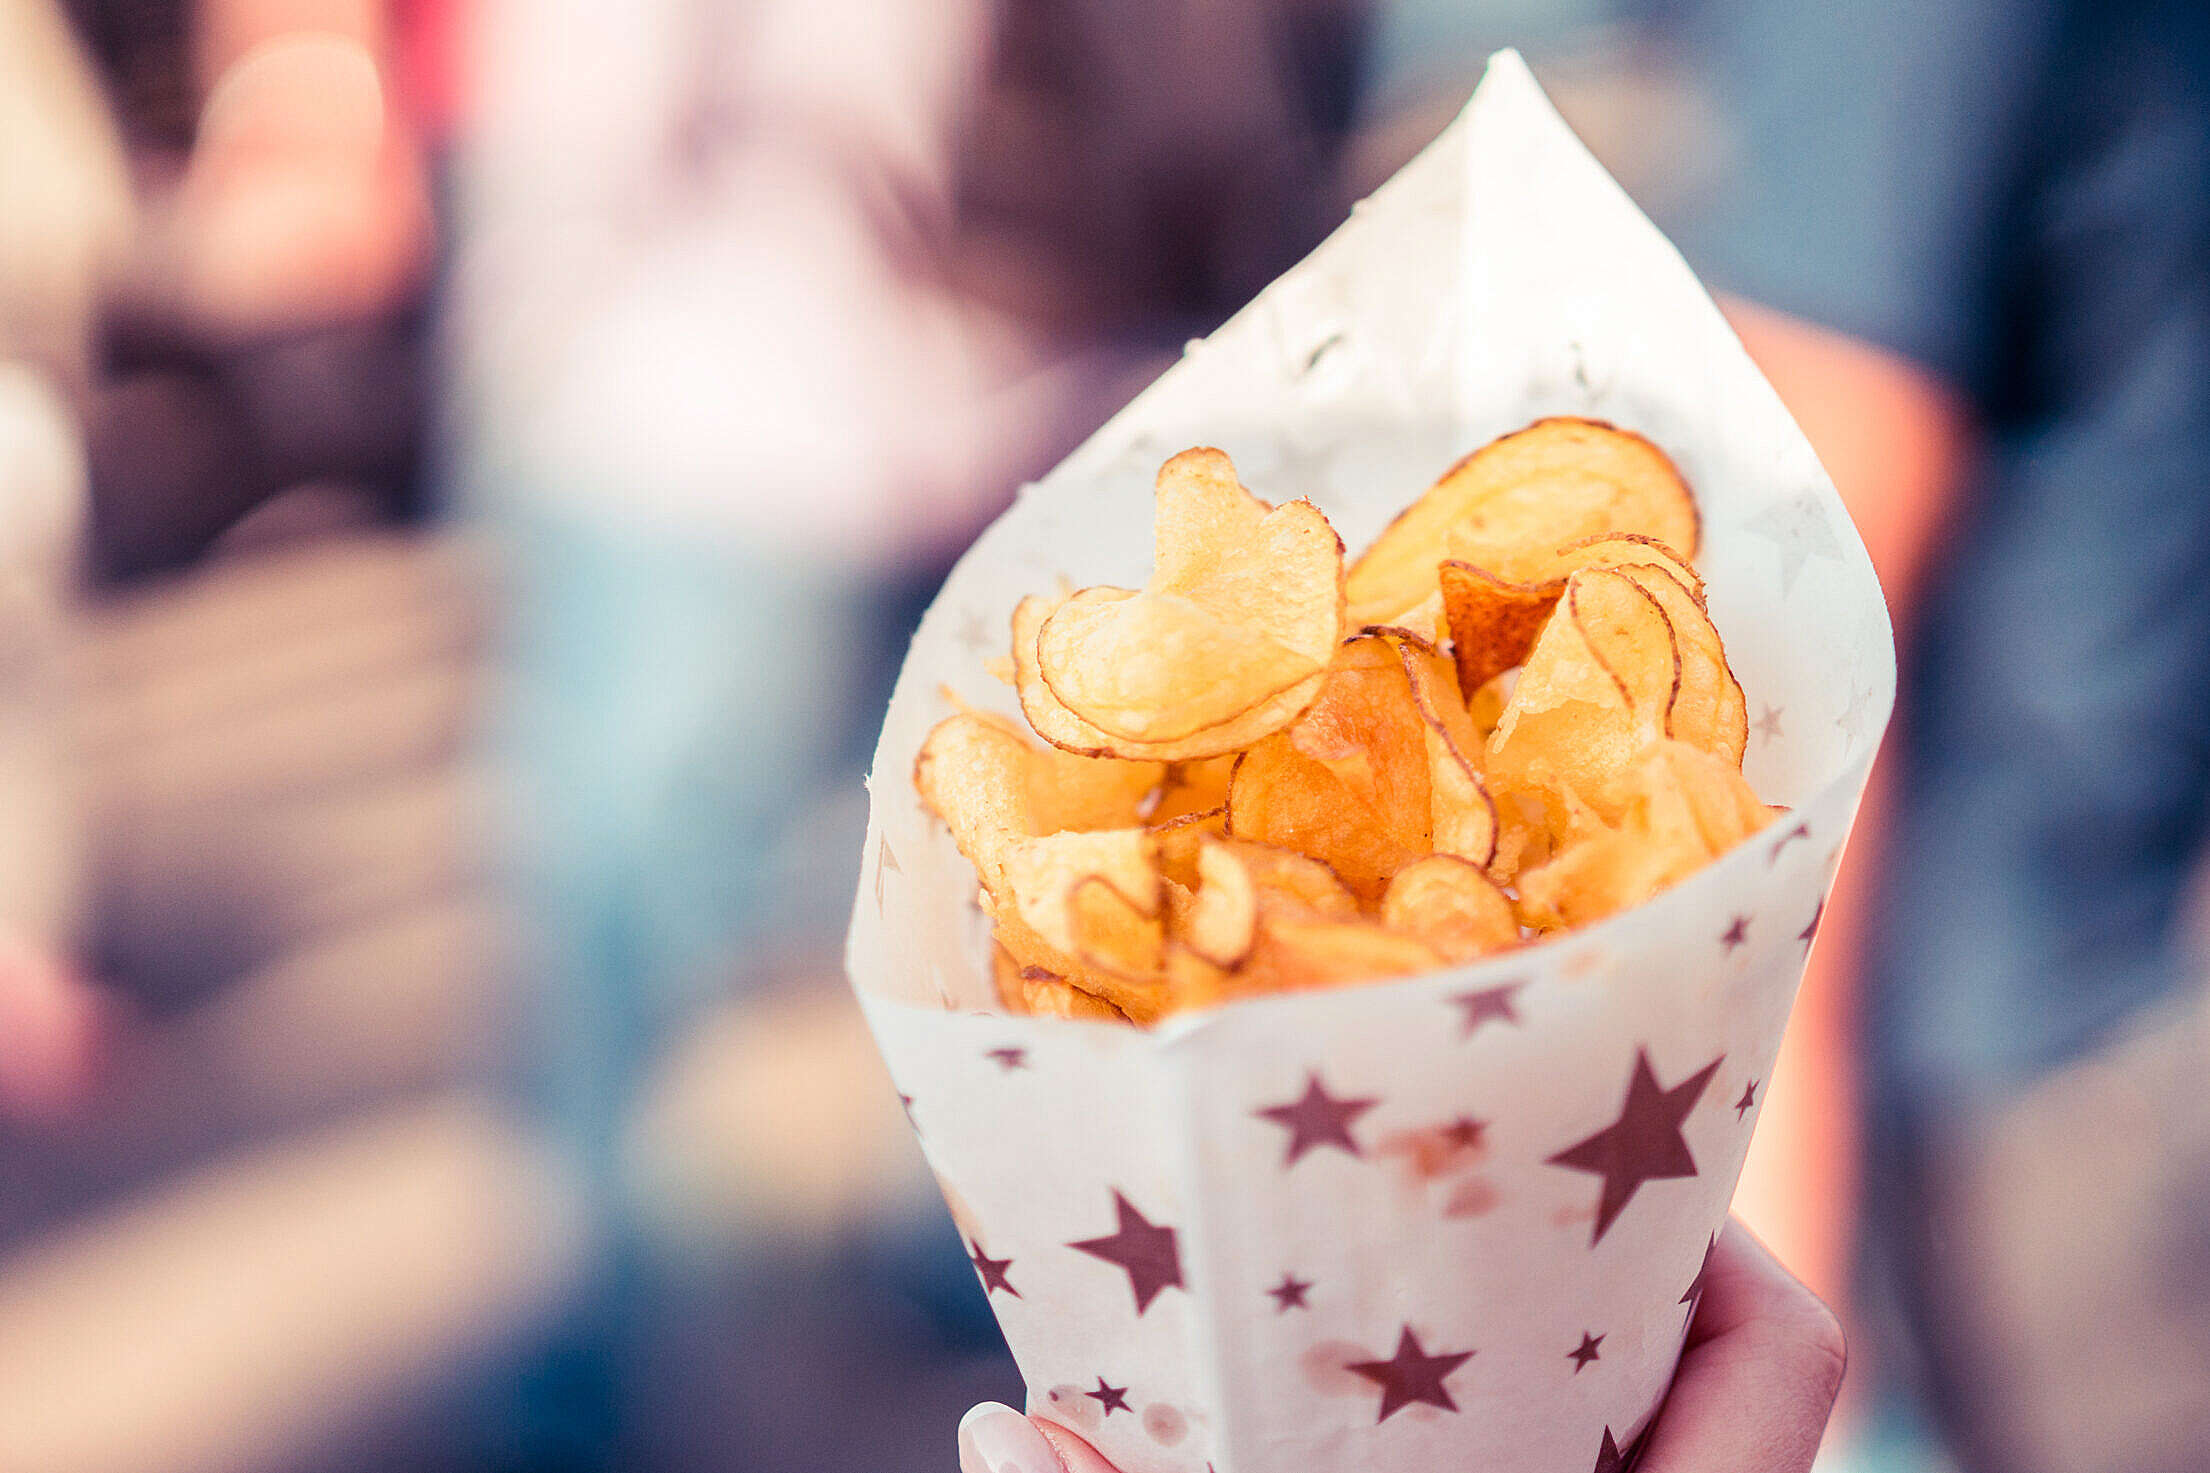 Potato Chips in a Cornet Free Stock Photo